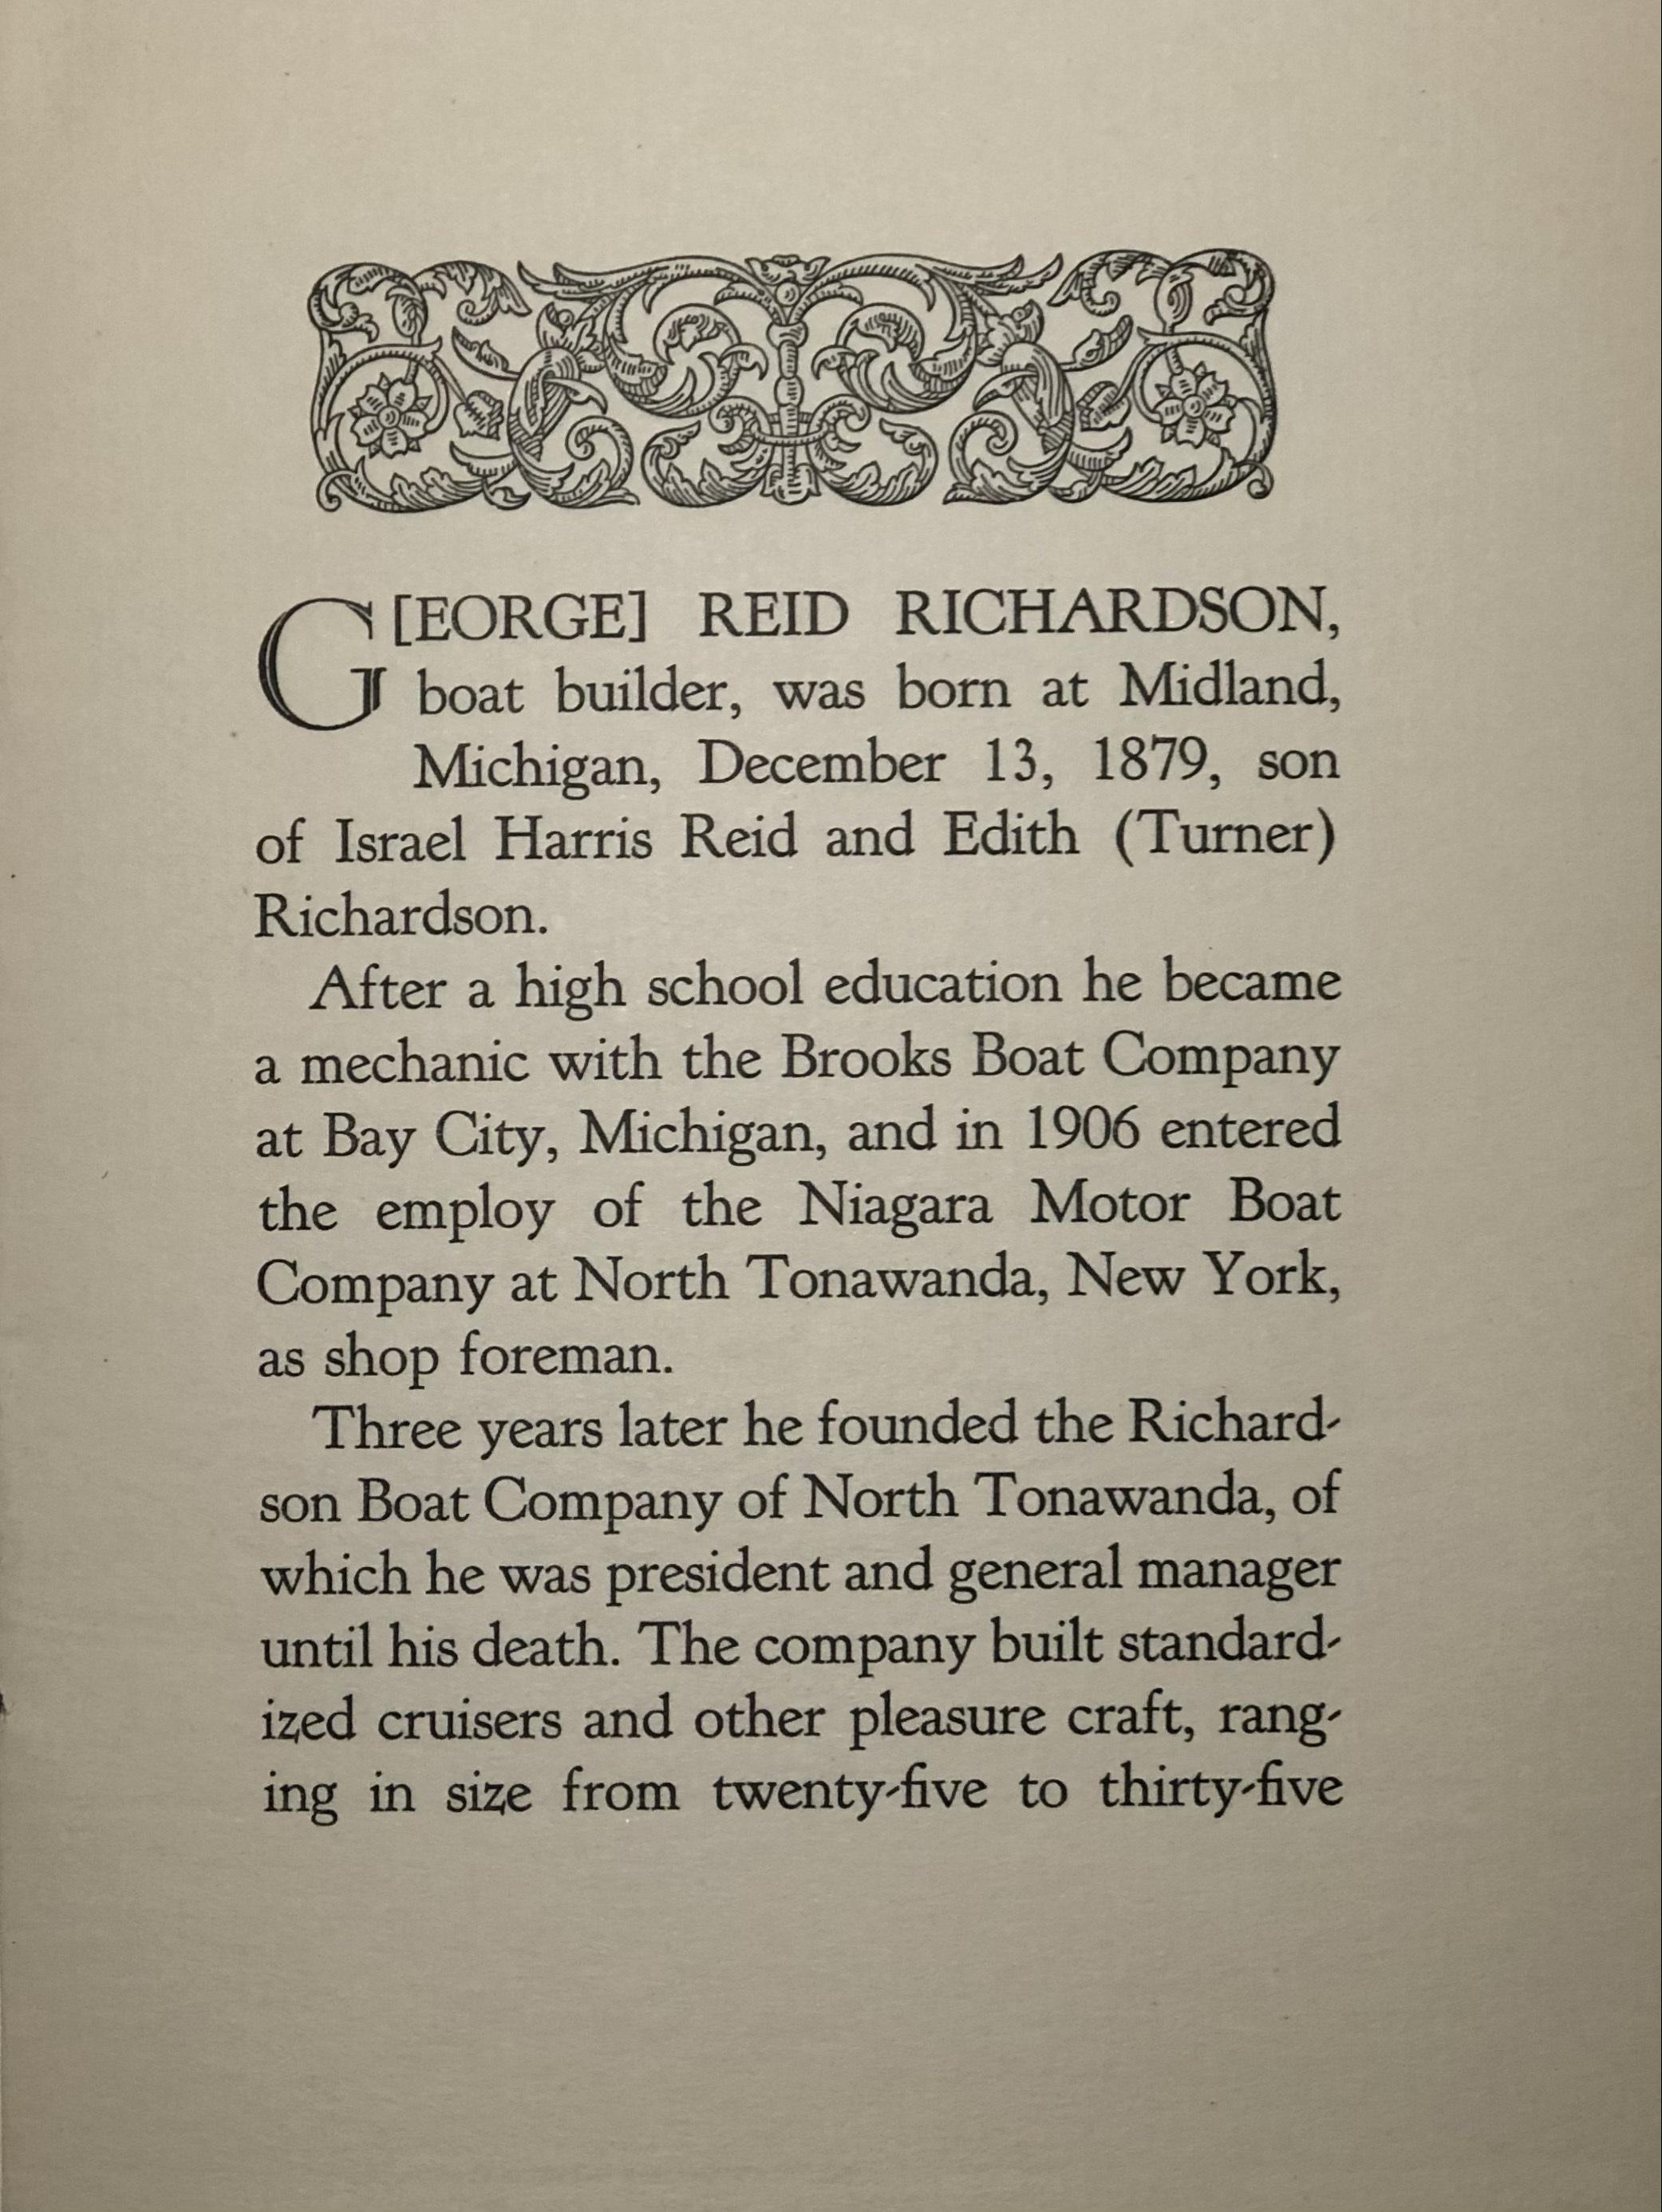 G Reid Richardson, biographical pamphlet 2.jpg